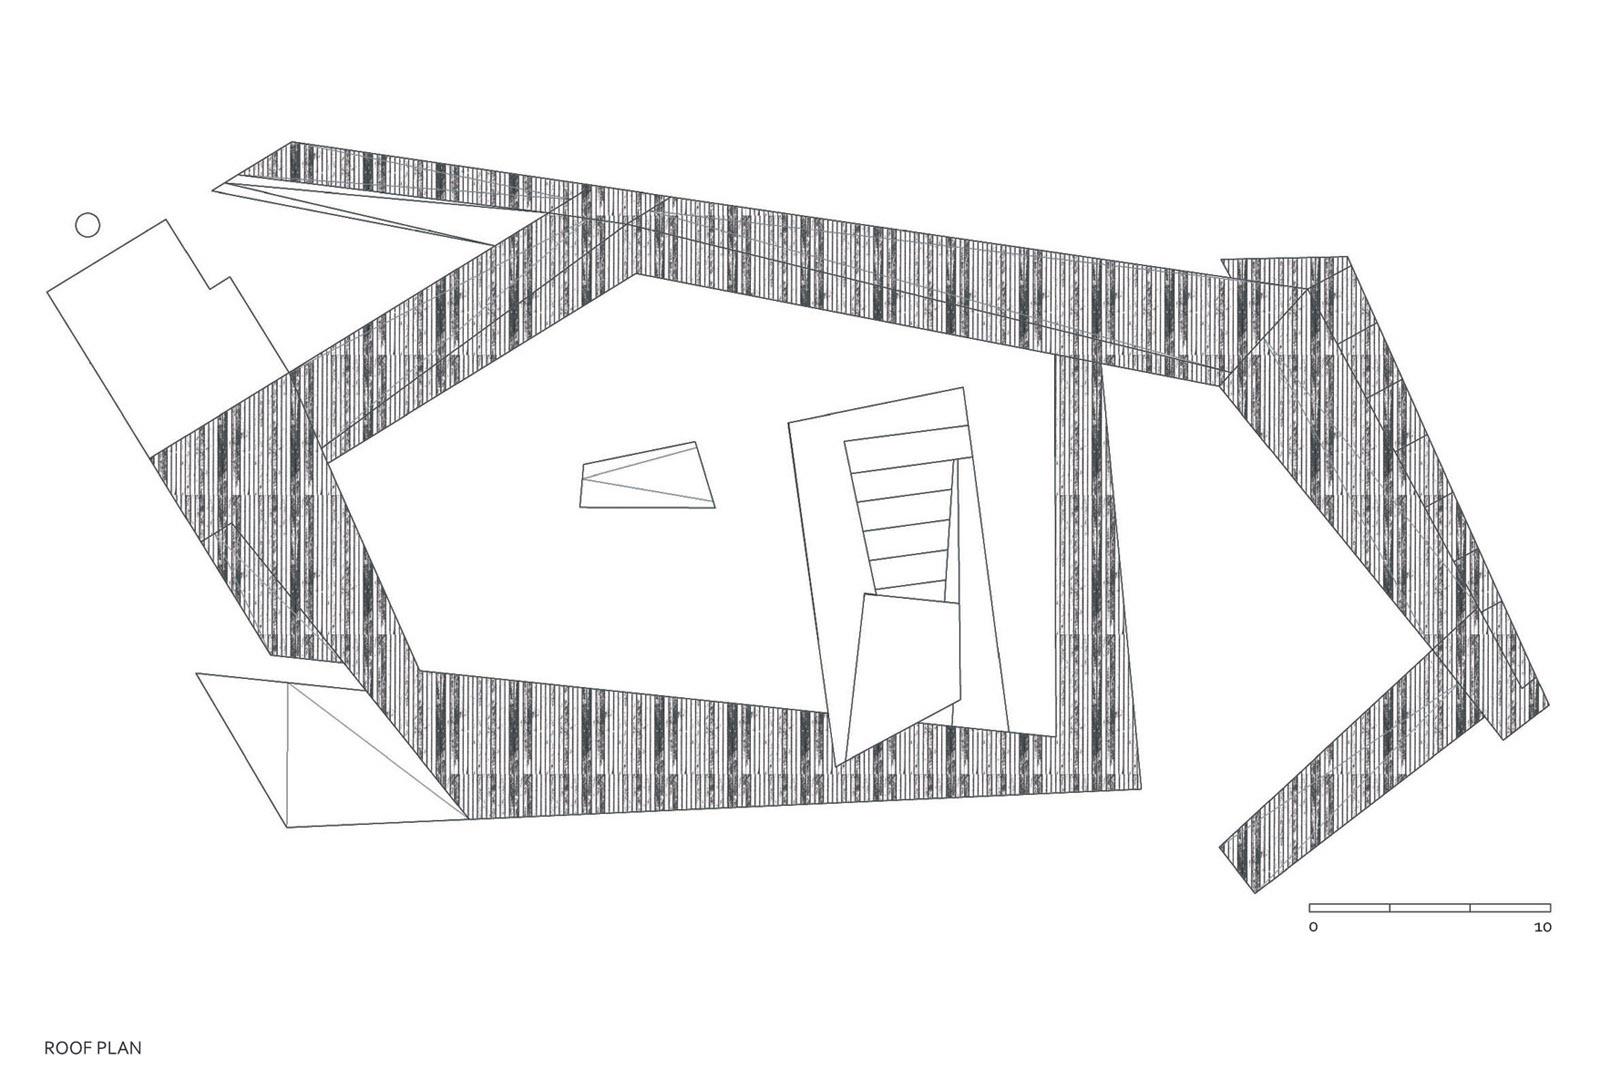 Europan7-7_roof-plan1.jpg